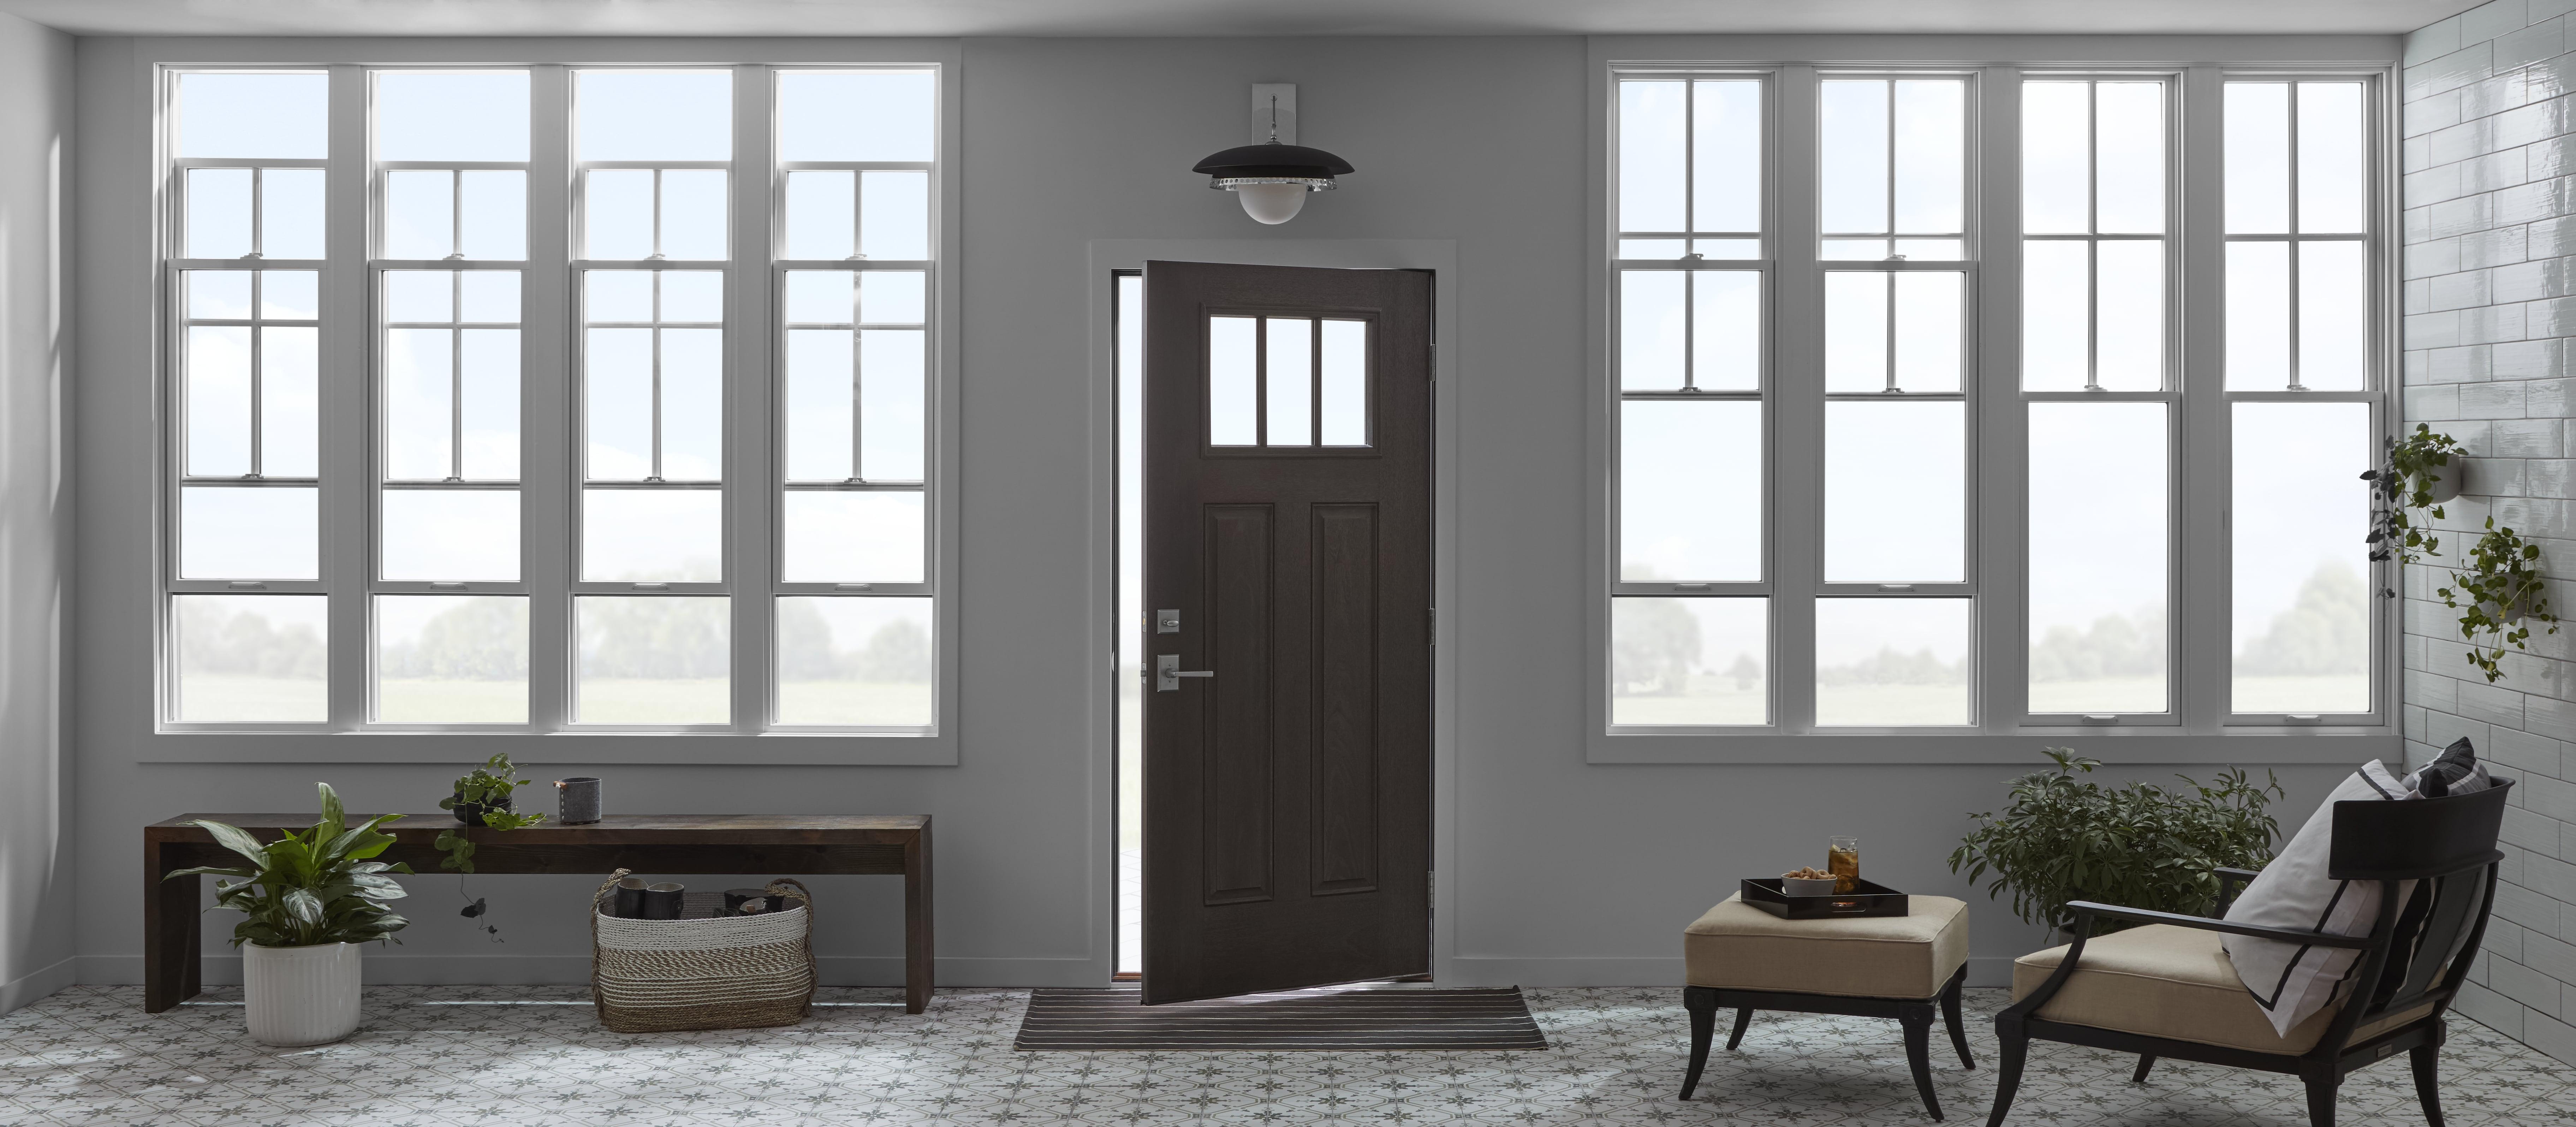 Pella Windows Doors 1883 M 119 Petoskey Mi 49770 Yp